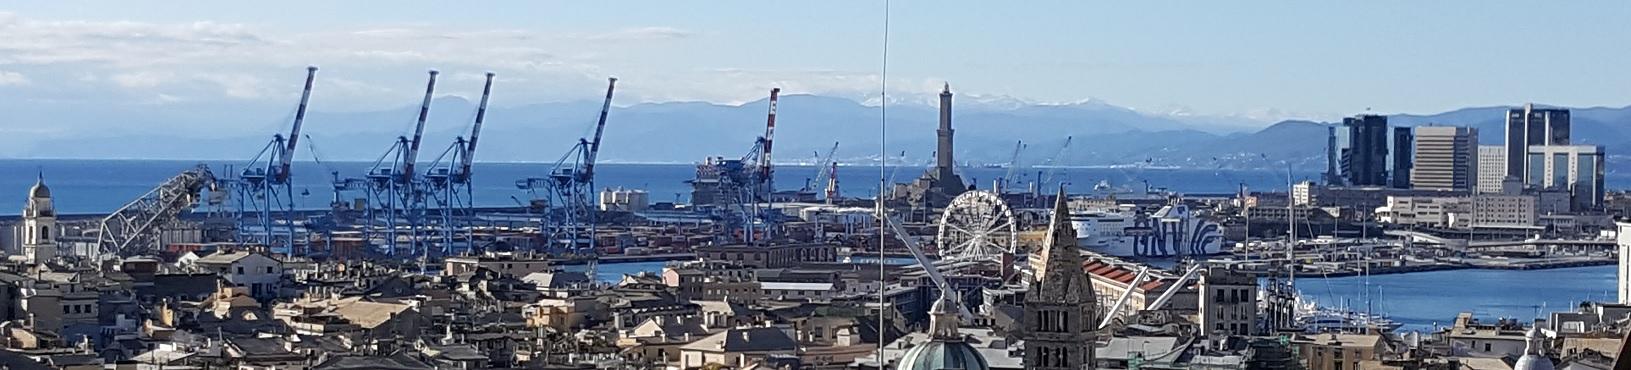 Genova, Città Metropolitana di Genova e Regione Liguria raccontate dal quotidiano spagnolo El Pais